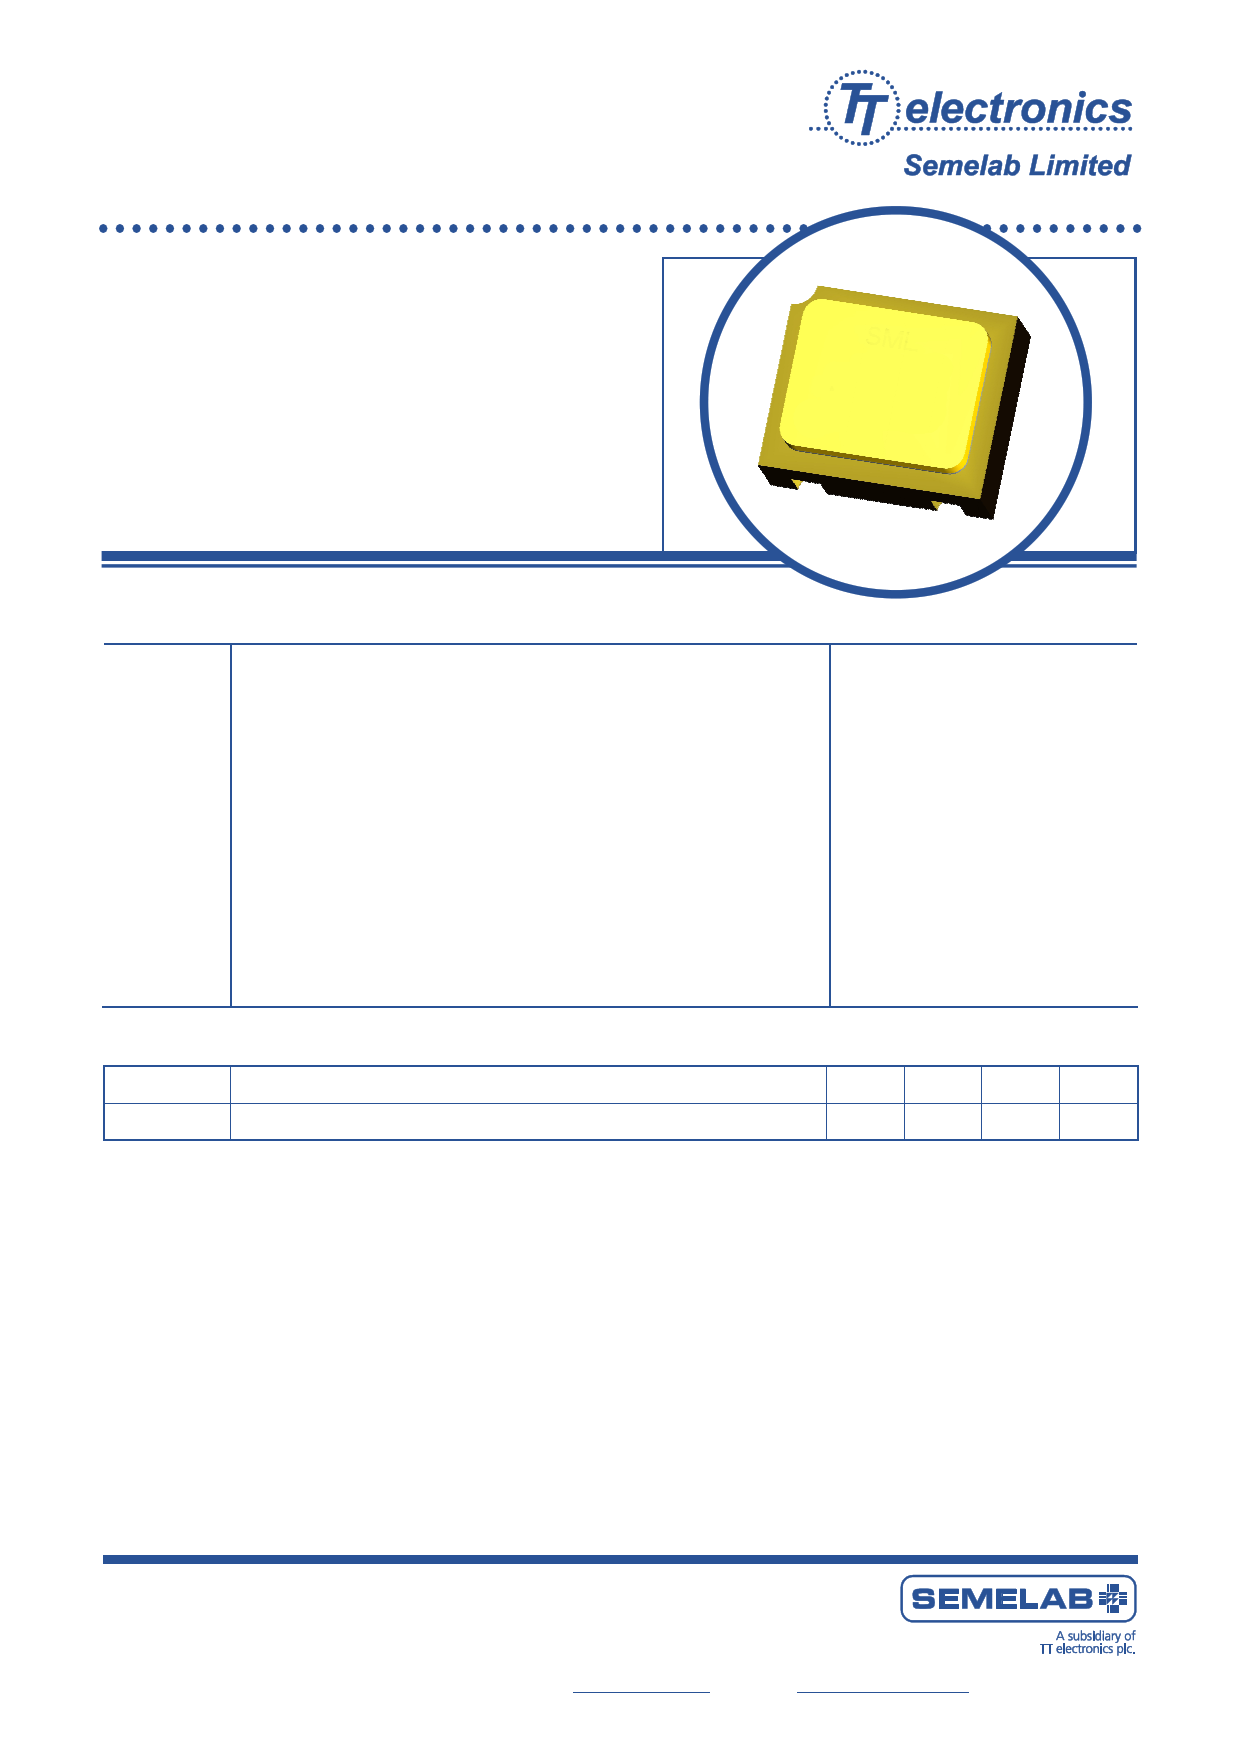 BFR92 데이터시트 및 BFR92 PDF